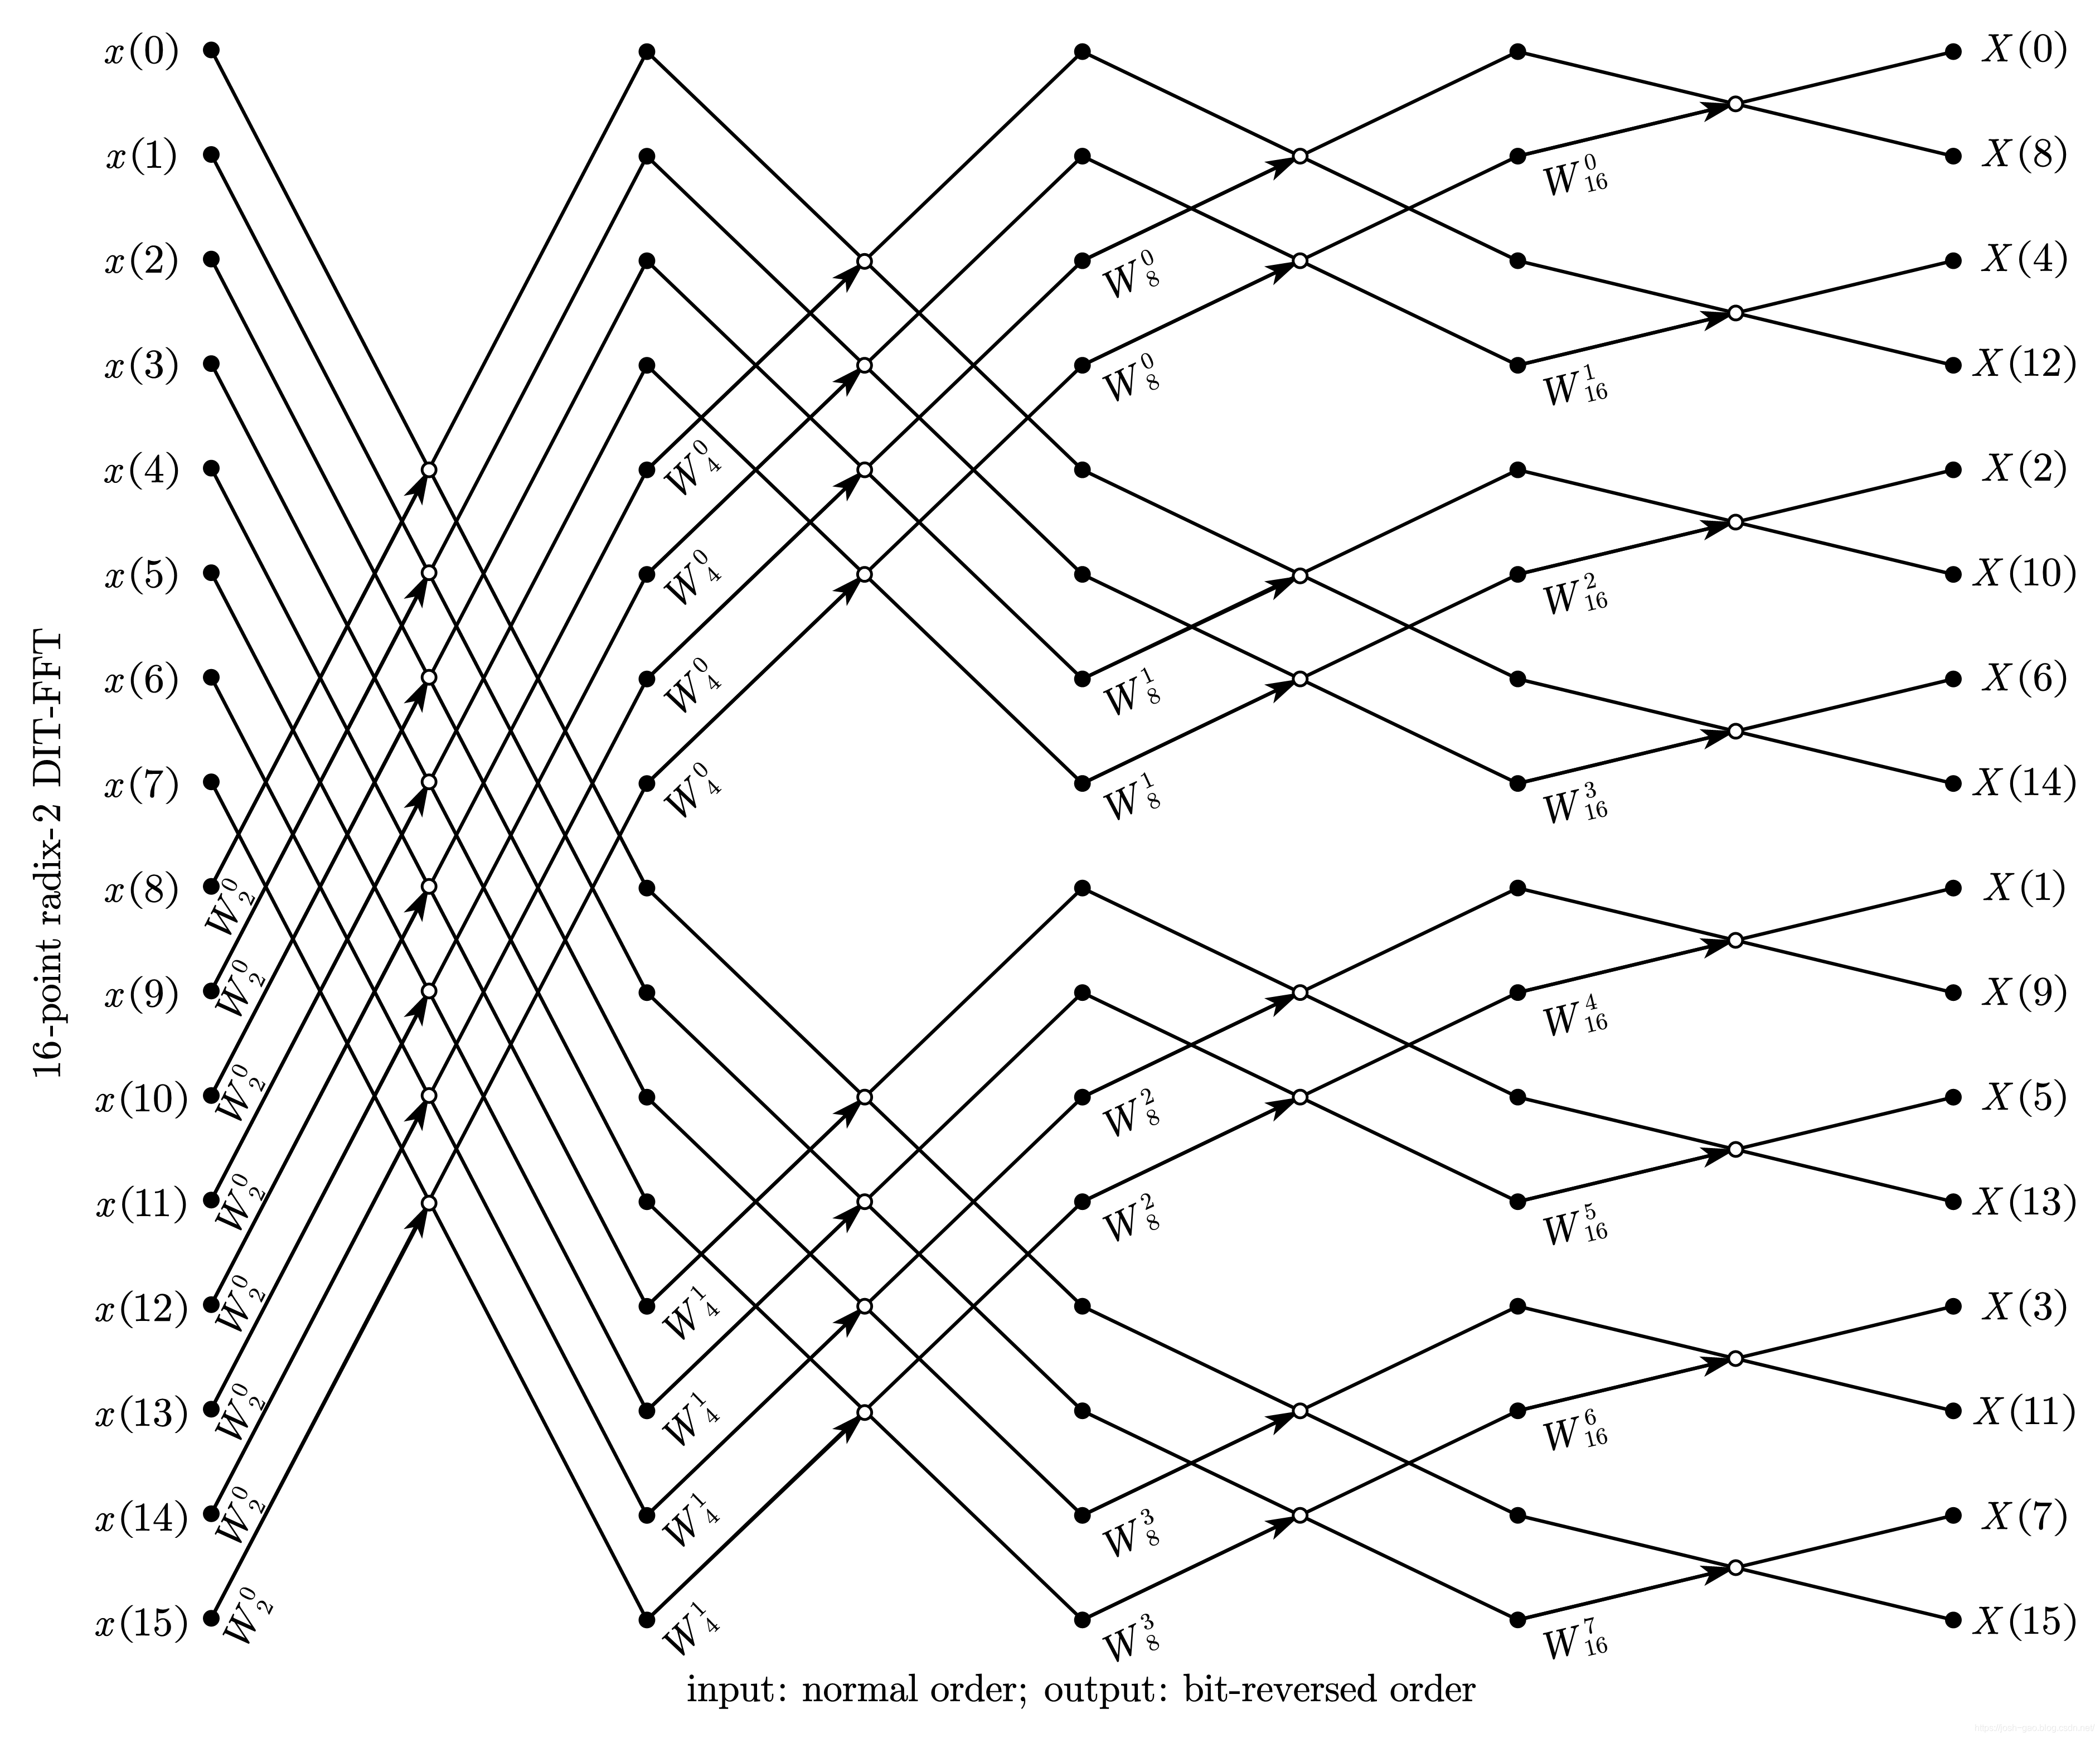 16-point radix-2 DIT-FFT 自然顺序输入、比特位反序输出